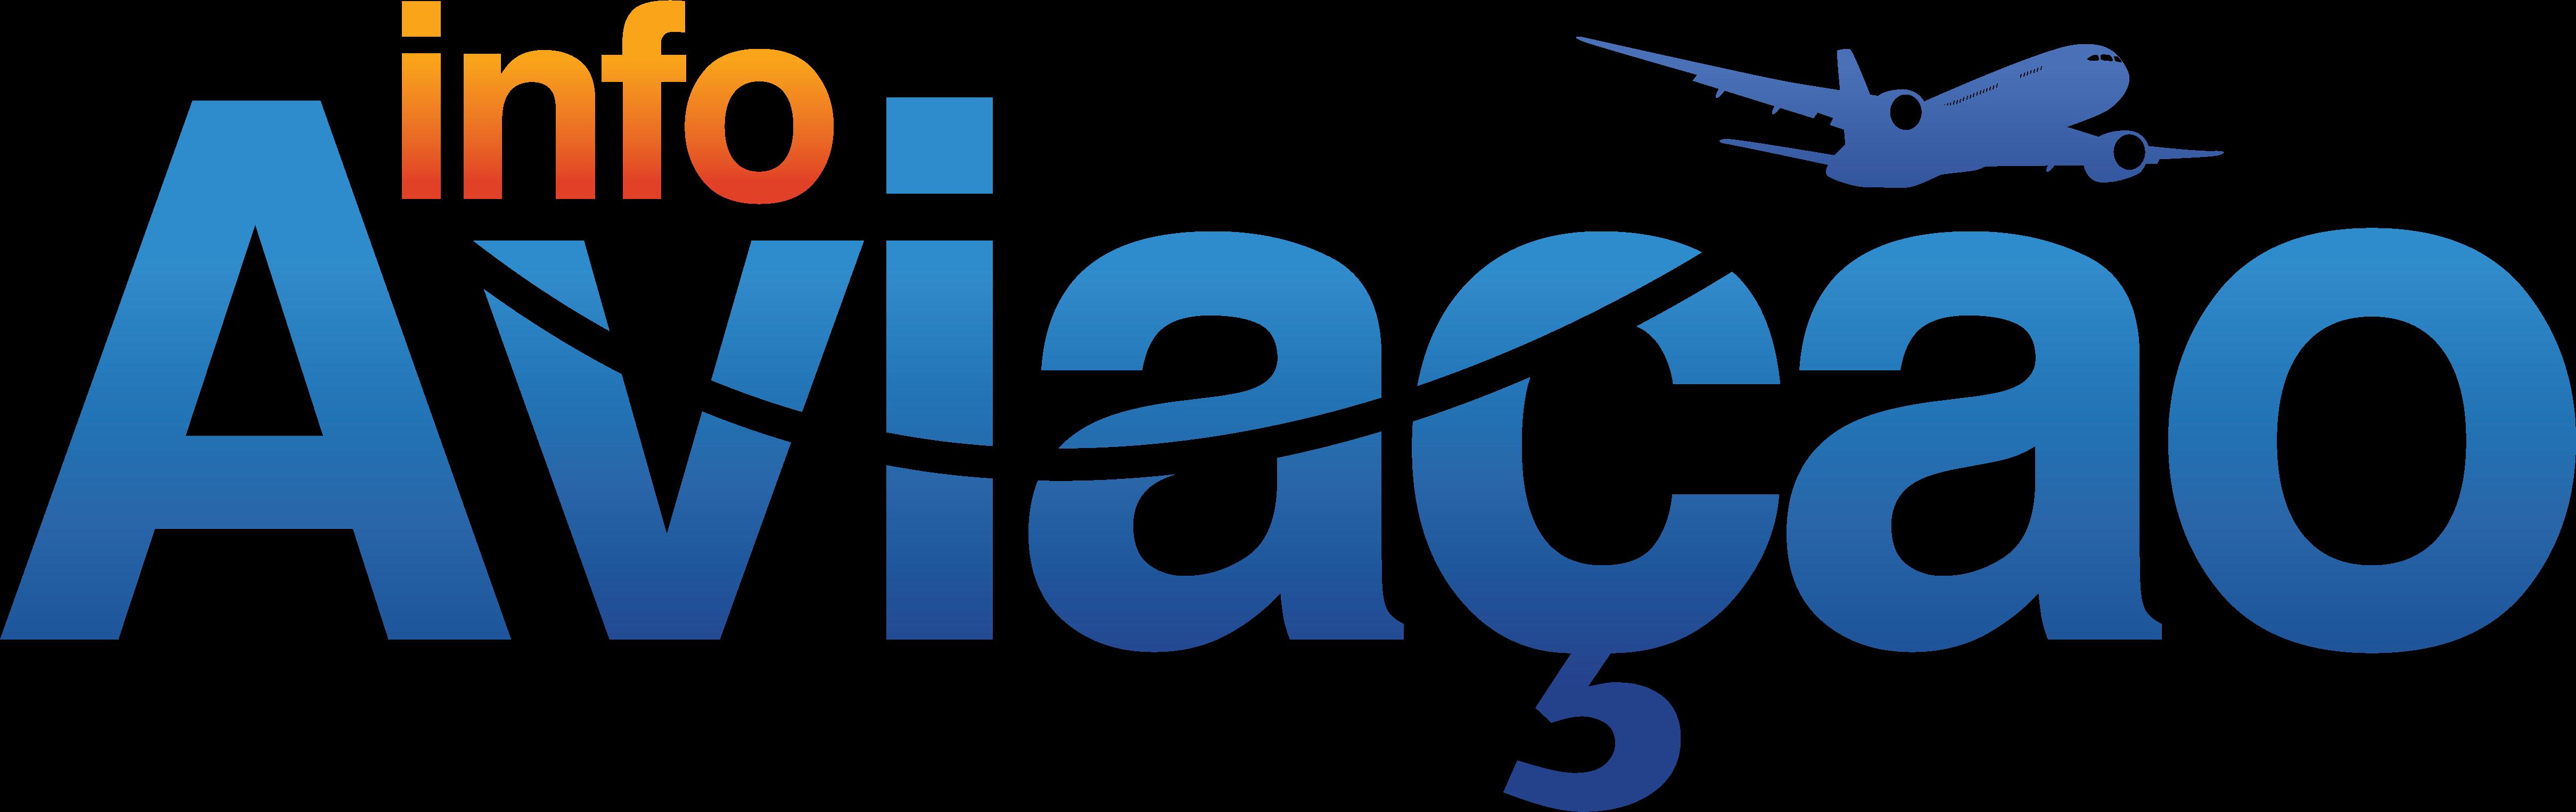 logo-info-aviacao-1